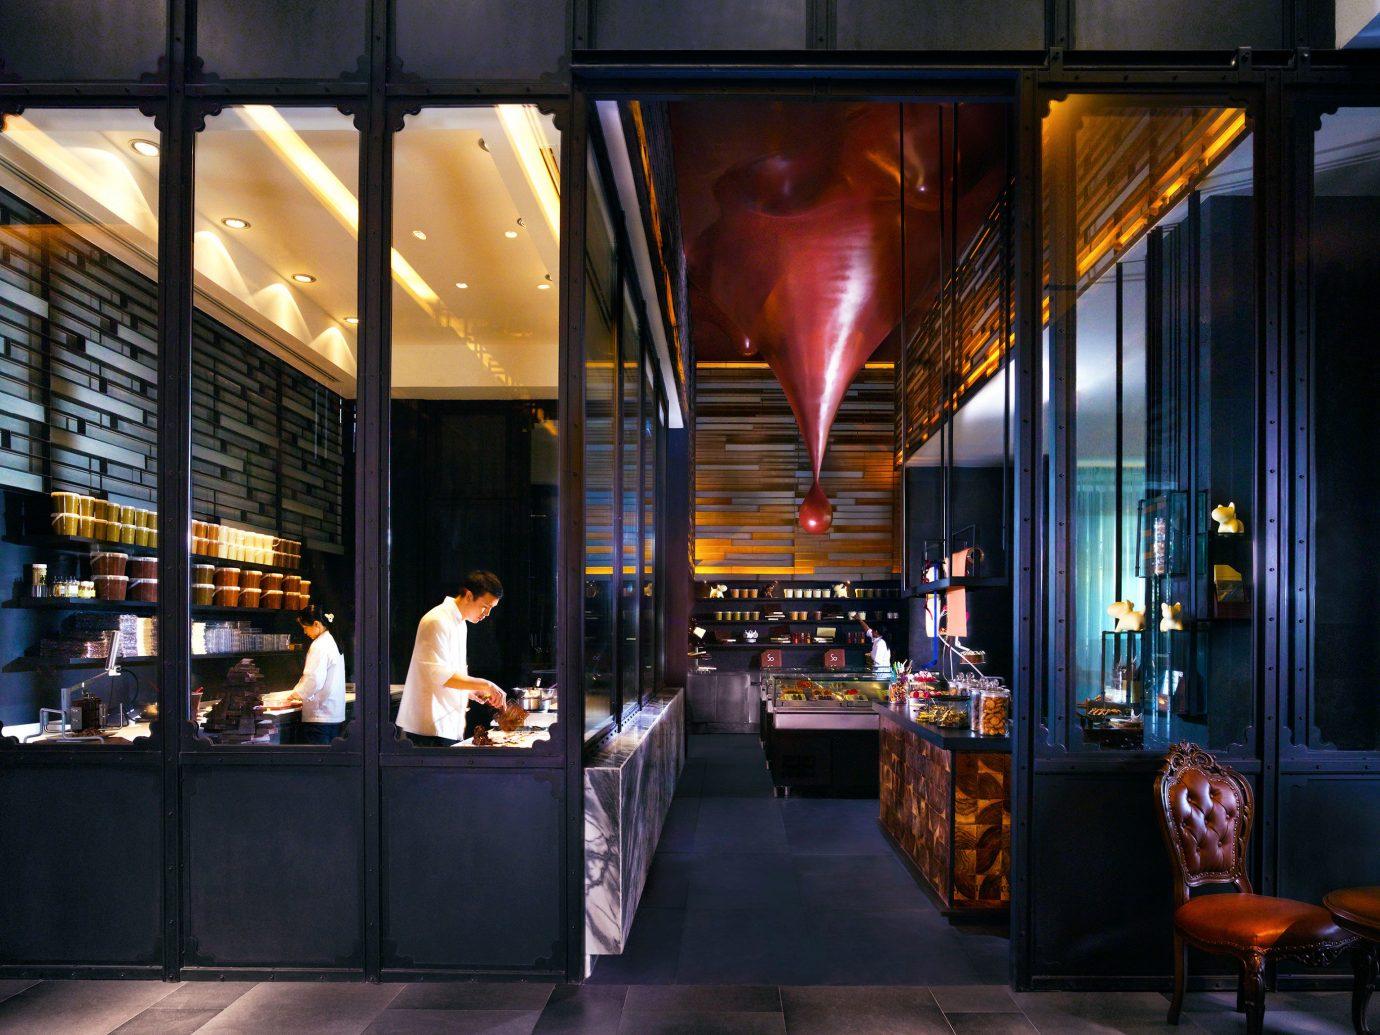 Architecture City Design Dining Eat Hip Hotels Luxury Scenic views window restaurant Bar interior design meal